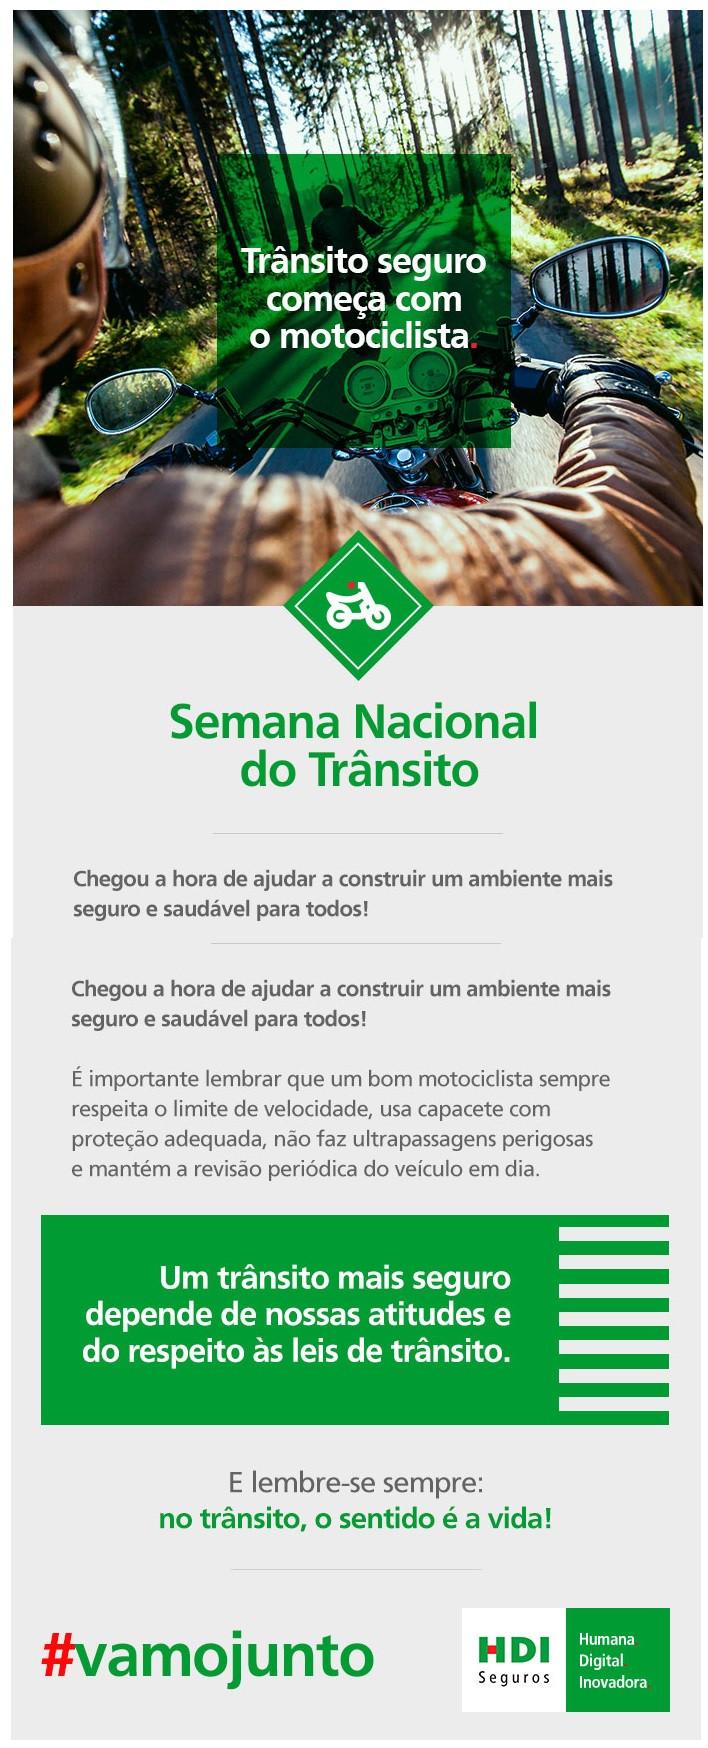 Semana Nacional do Trânsito, HDI Seguros